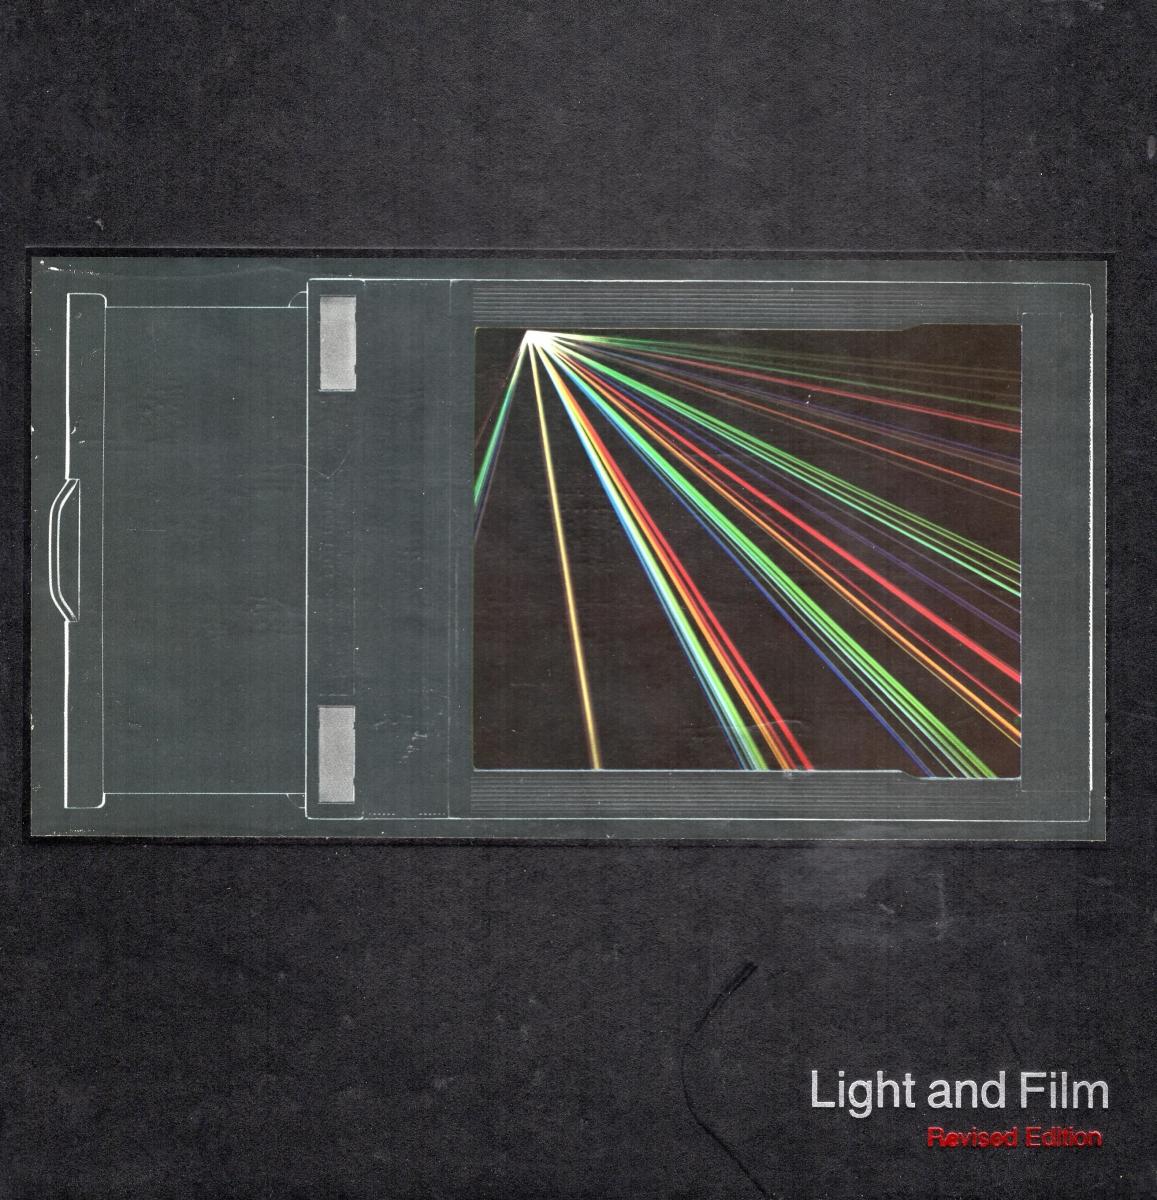 Light-and-Film